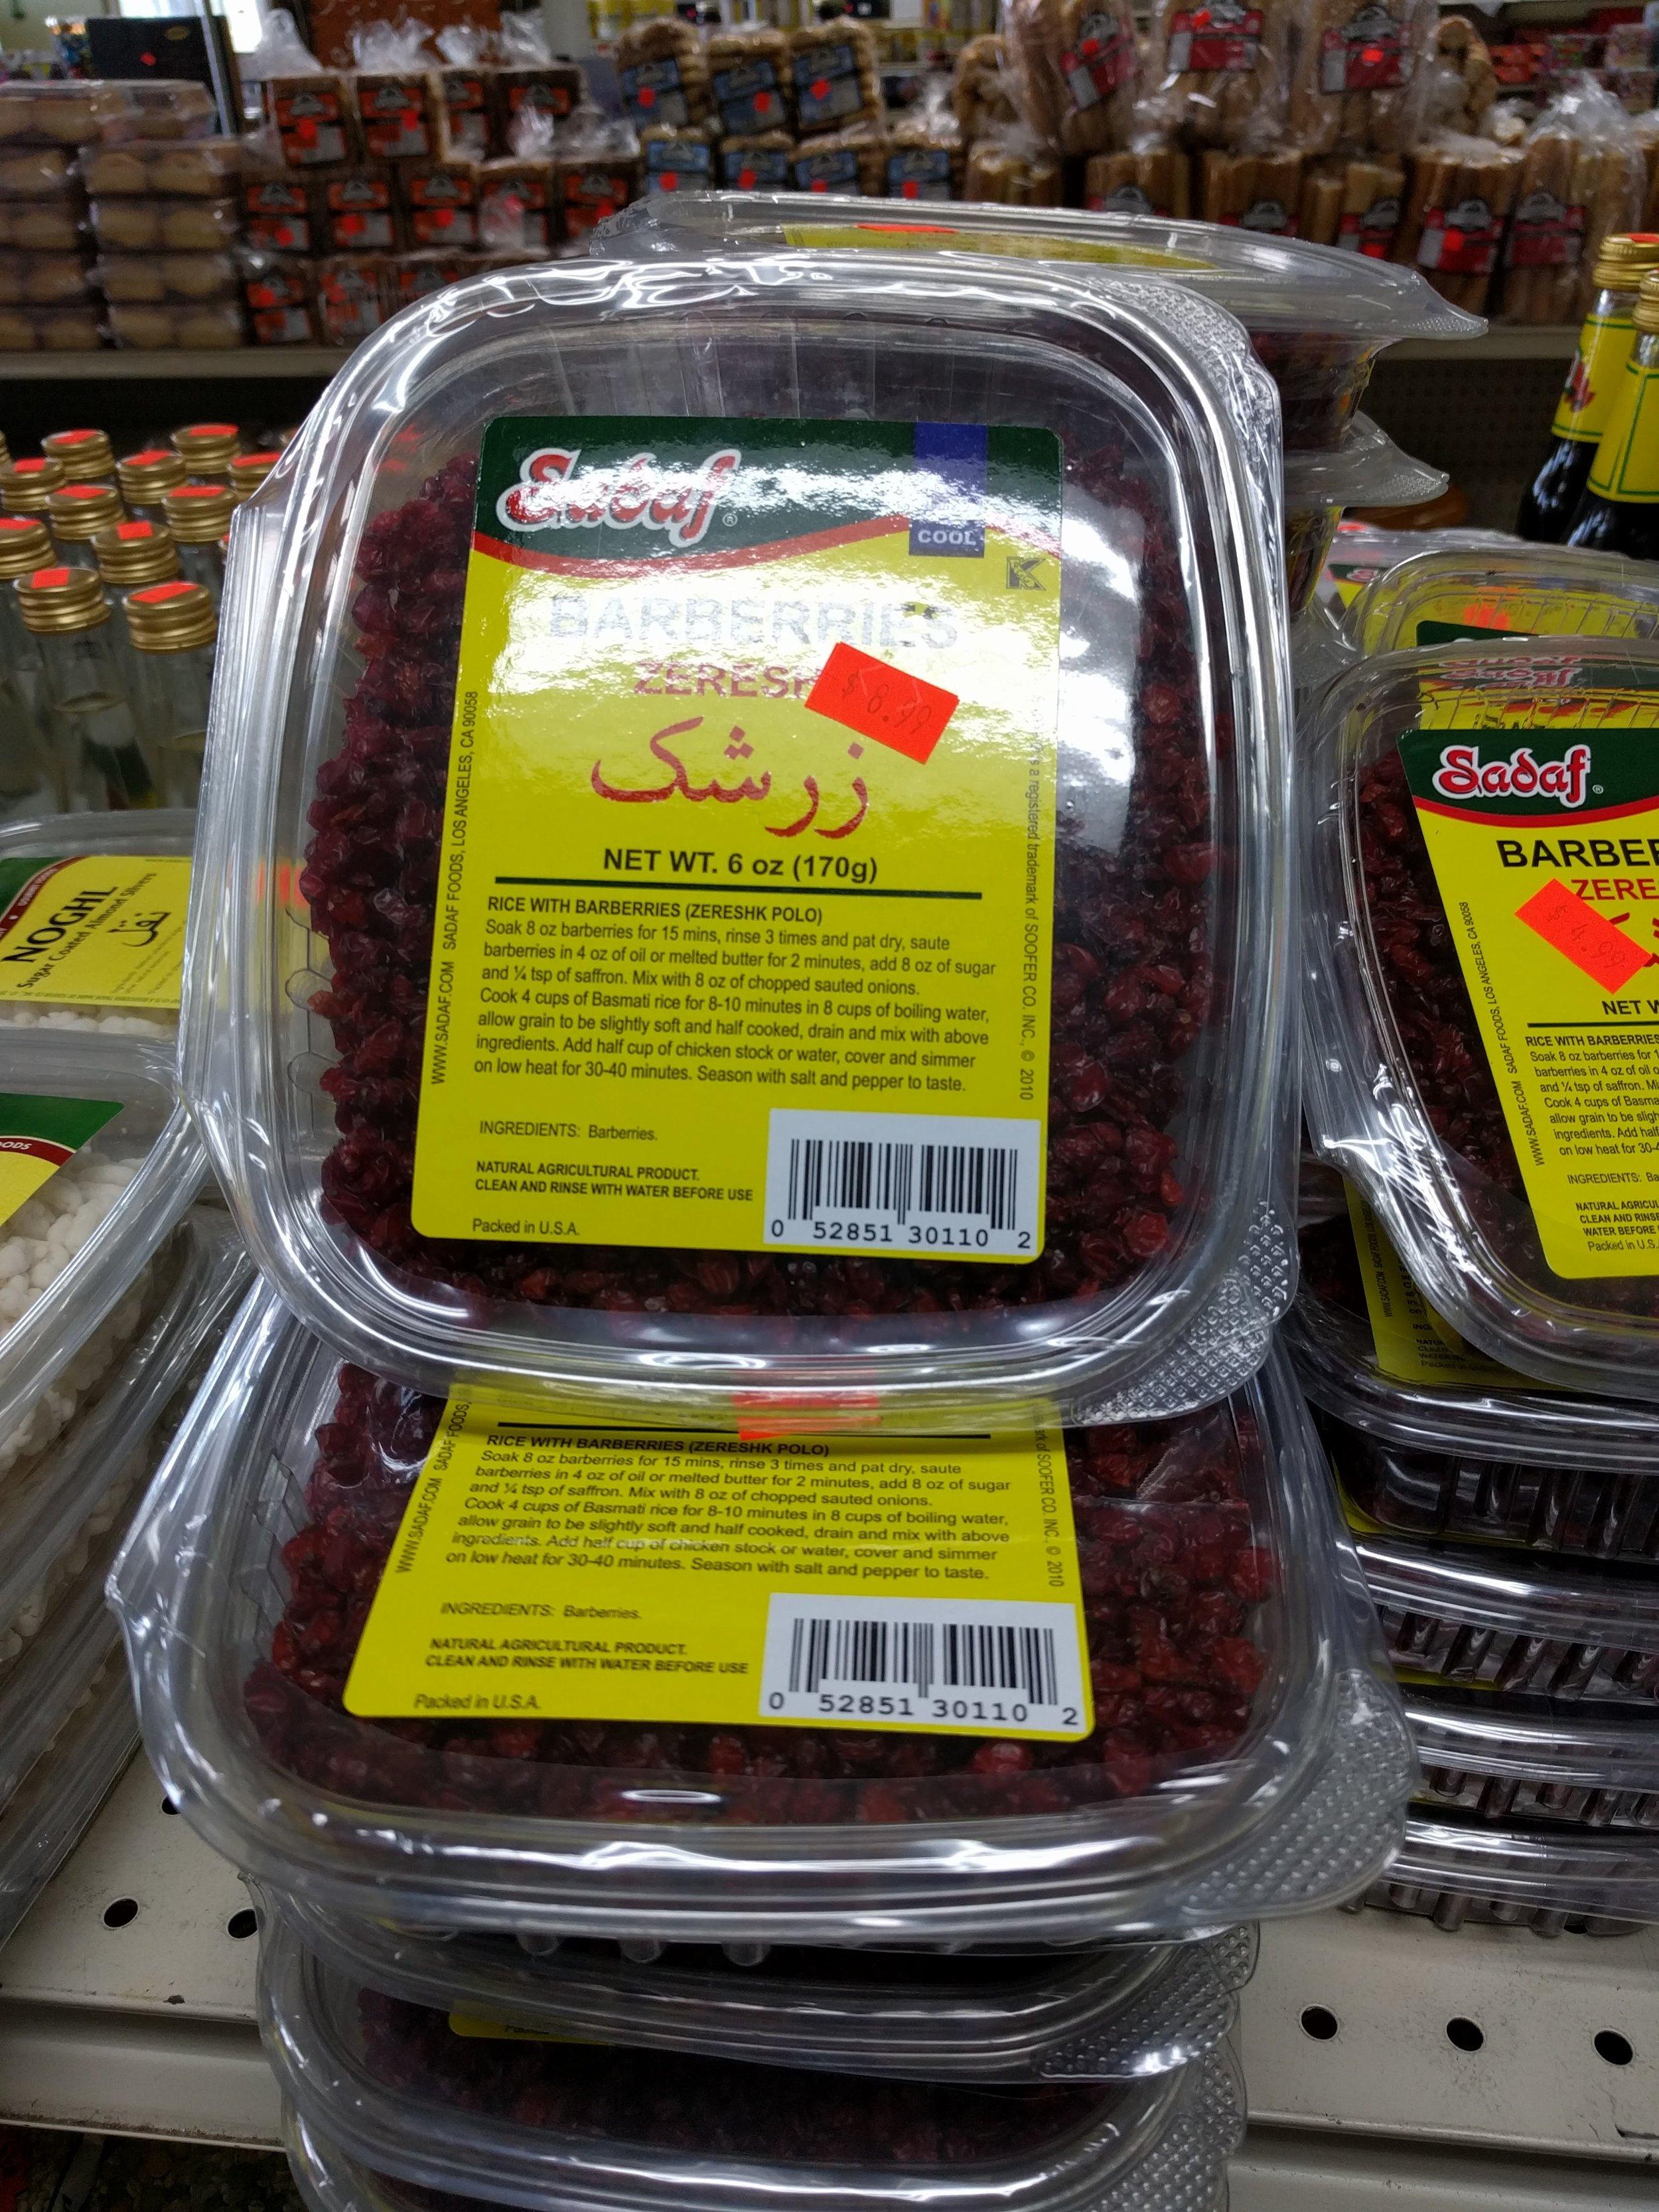 Sadaf-raspberries-Pak-Halal-International-Foods-12259-W-87th-St-Pkwy-Lenexa-KS-66215.jpg